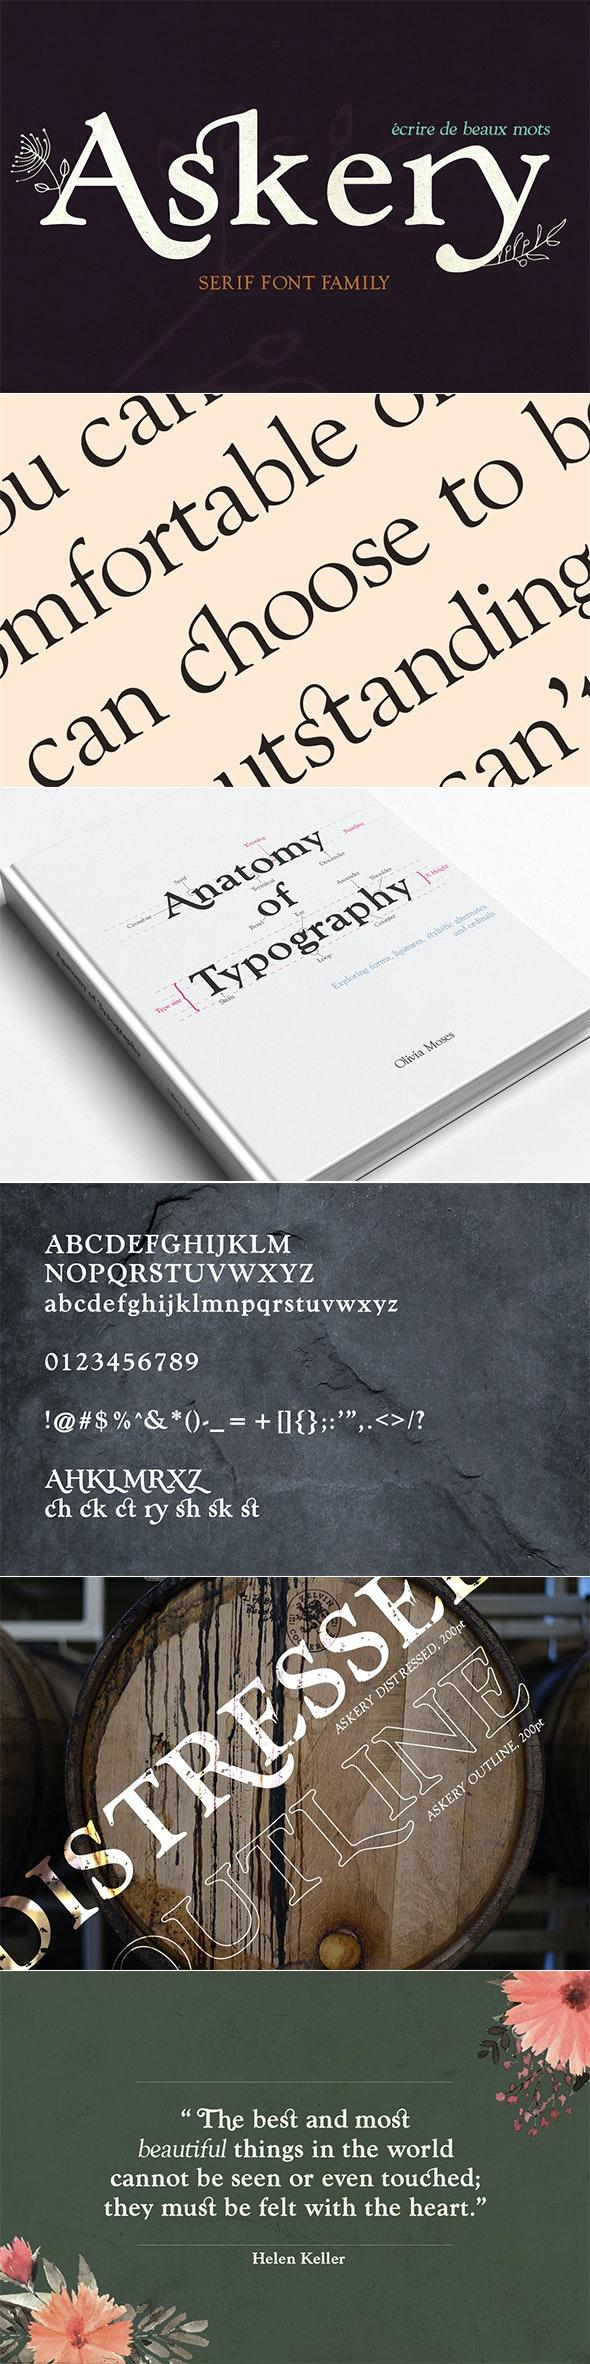 Askery Font Family - Serif Fonts